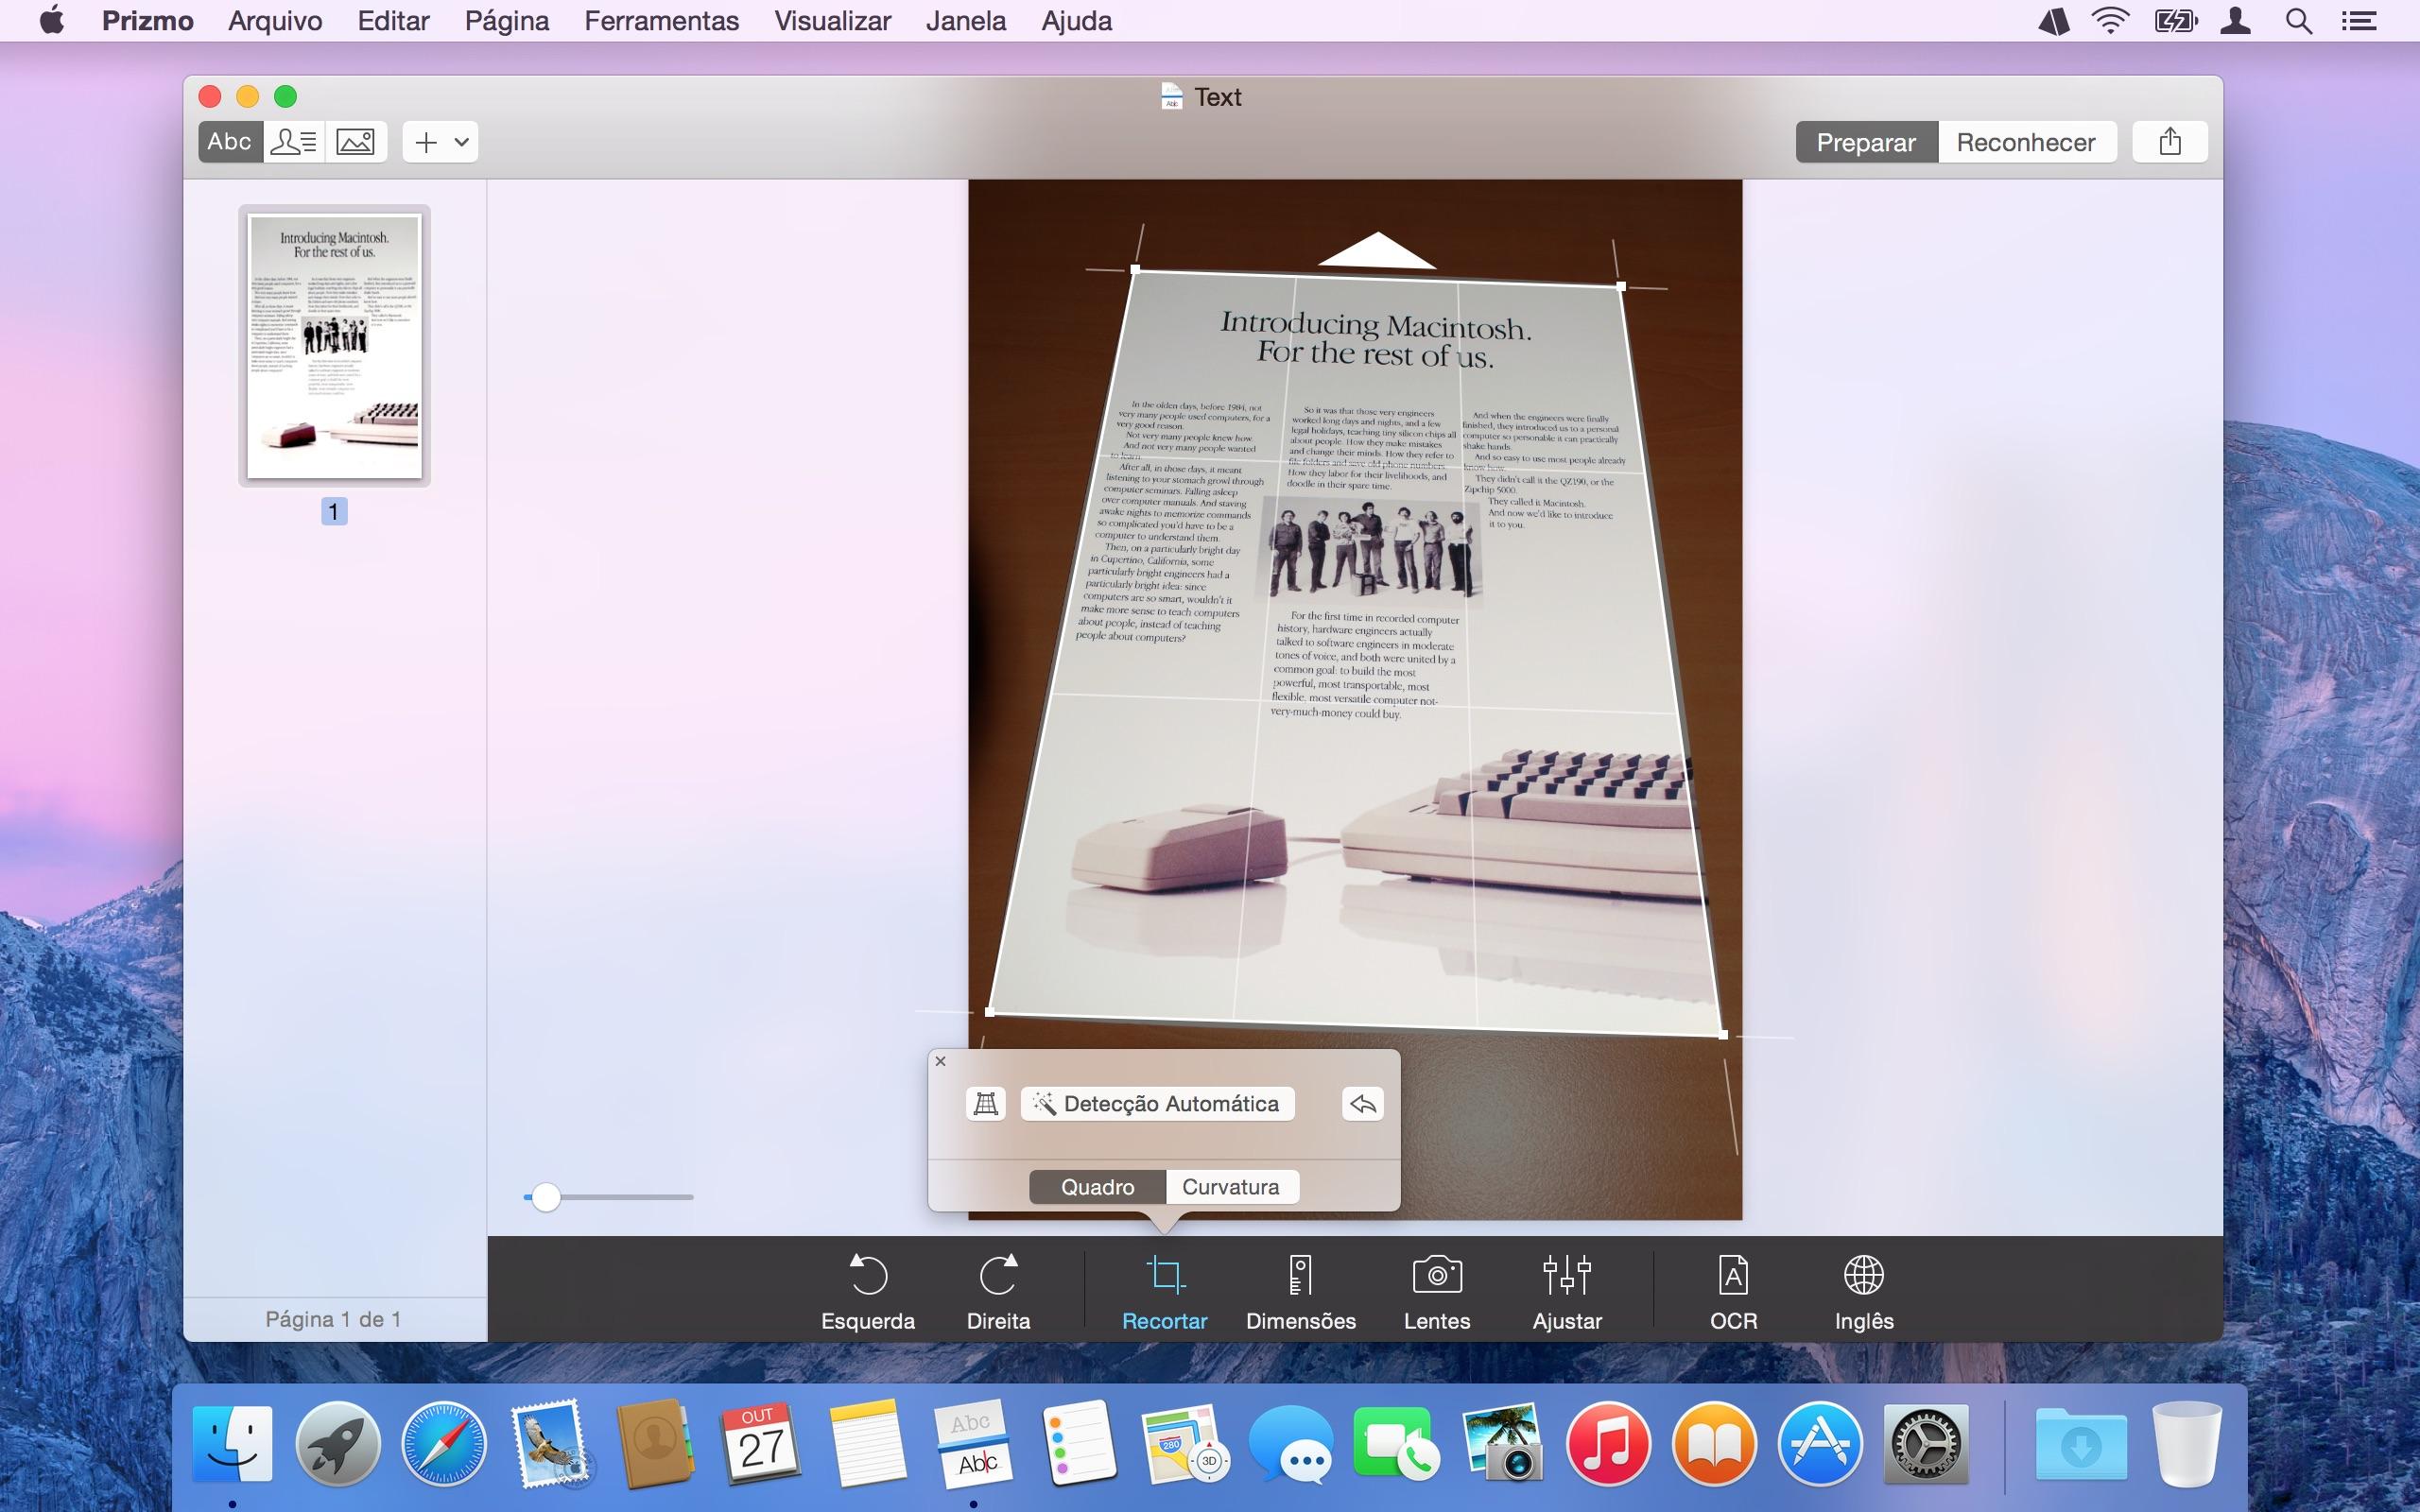 Screenshot do app Prizmo 4 › Pro Scanning + OCR